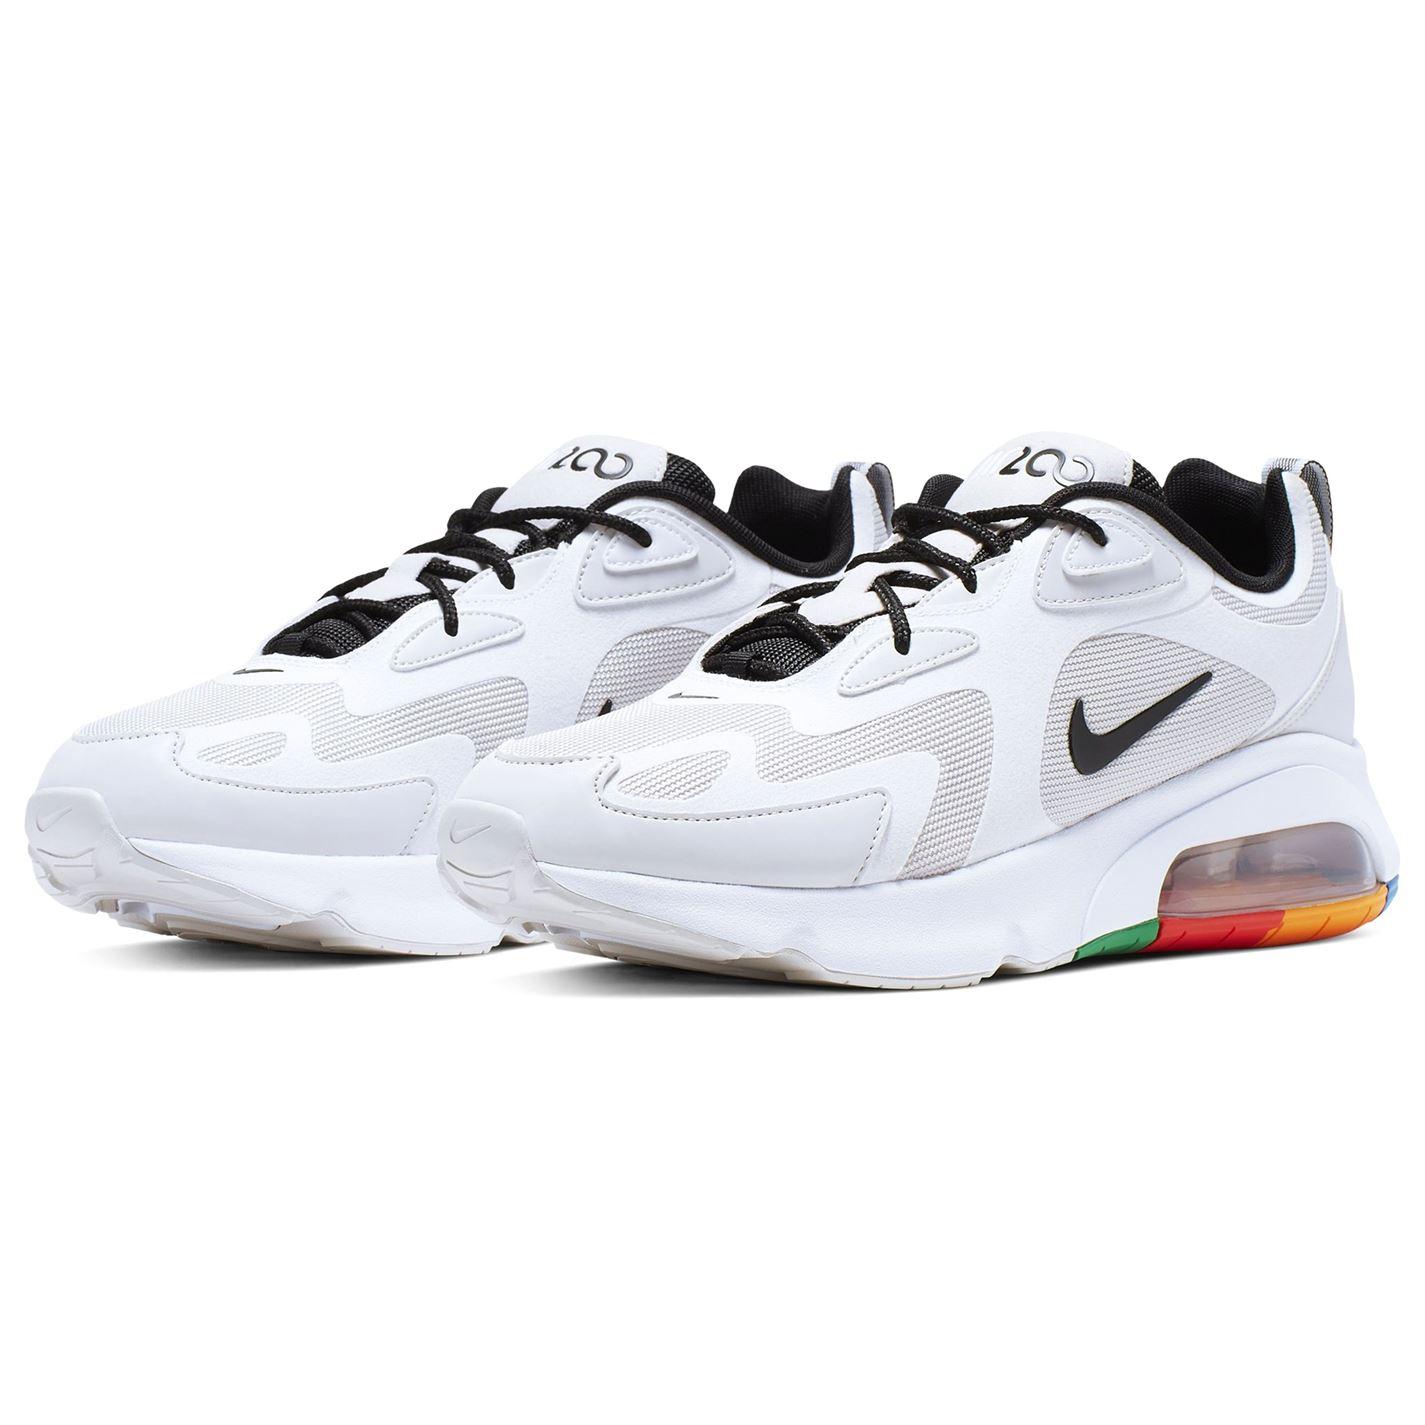 Nike Air Max 200 Sn01